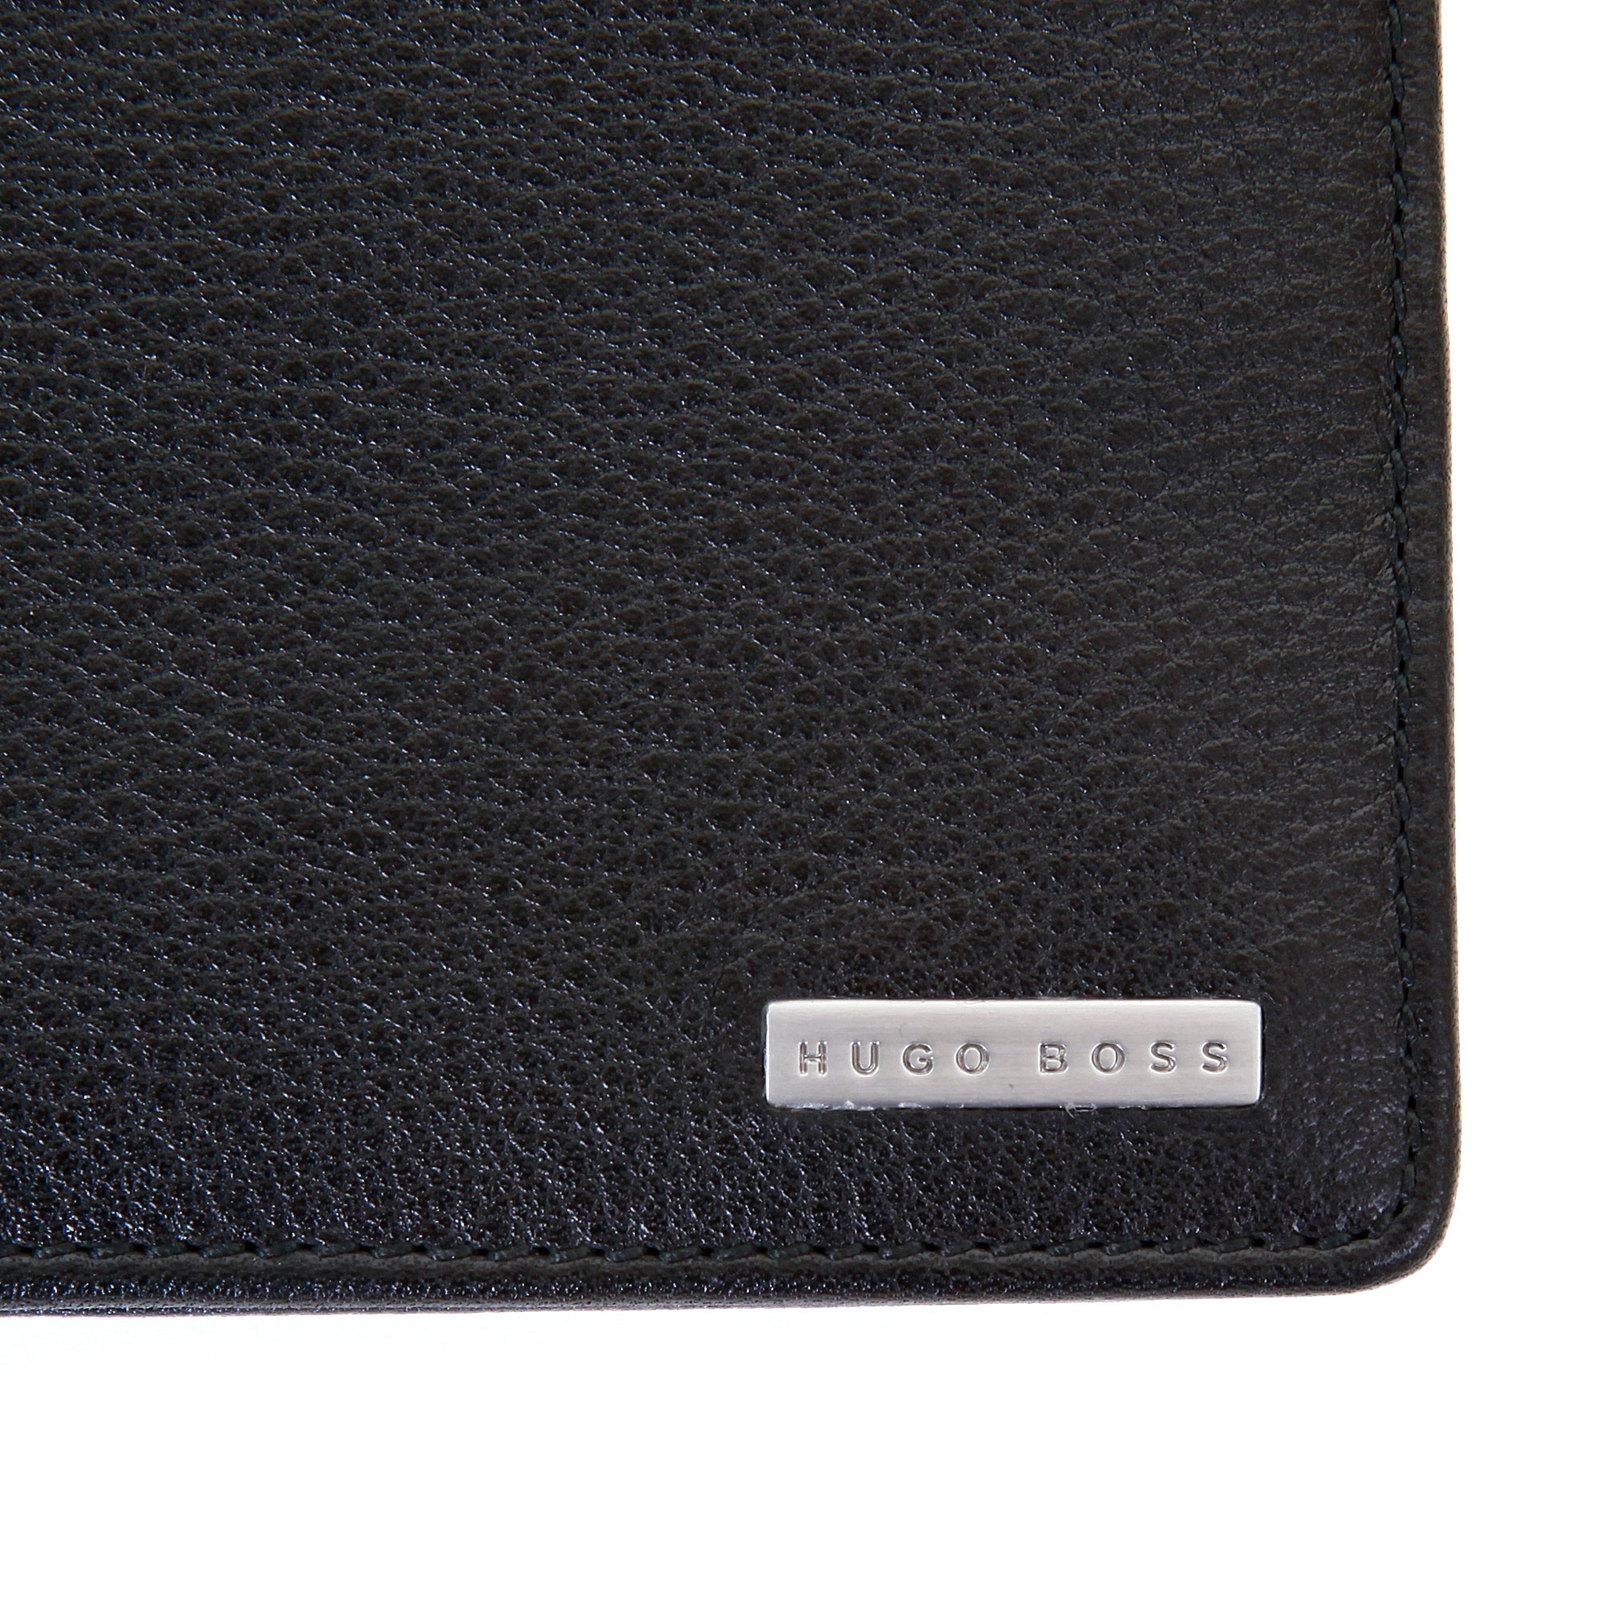 hugo boss black label mens bengi 50248893 black leather wallet boss2771 at togged clothing. Black Bedroom Furniture Sets. Home Design Ideas